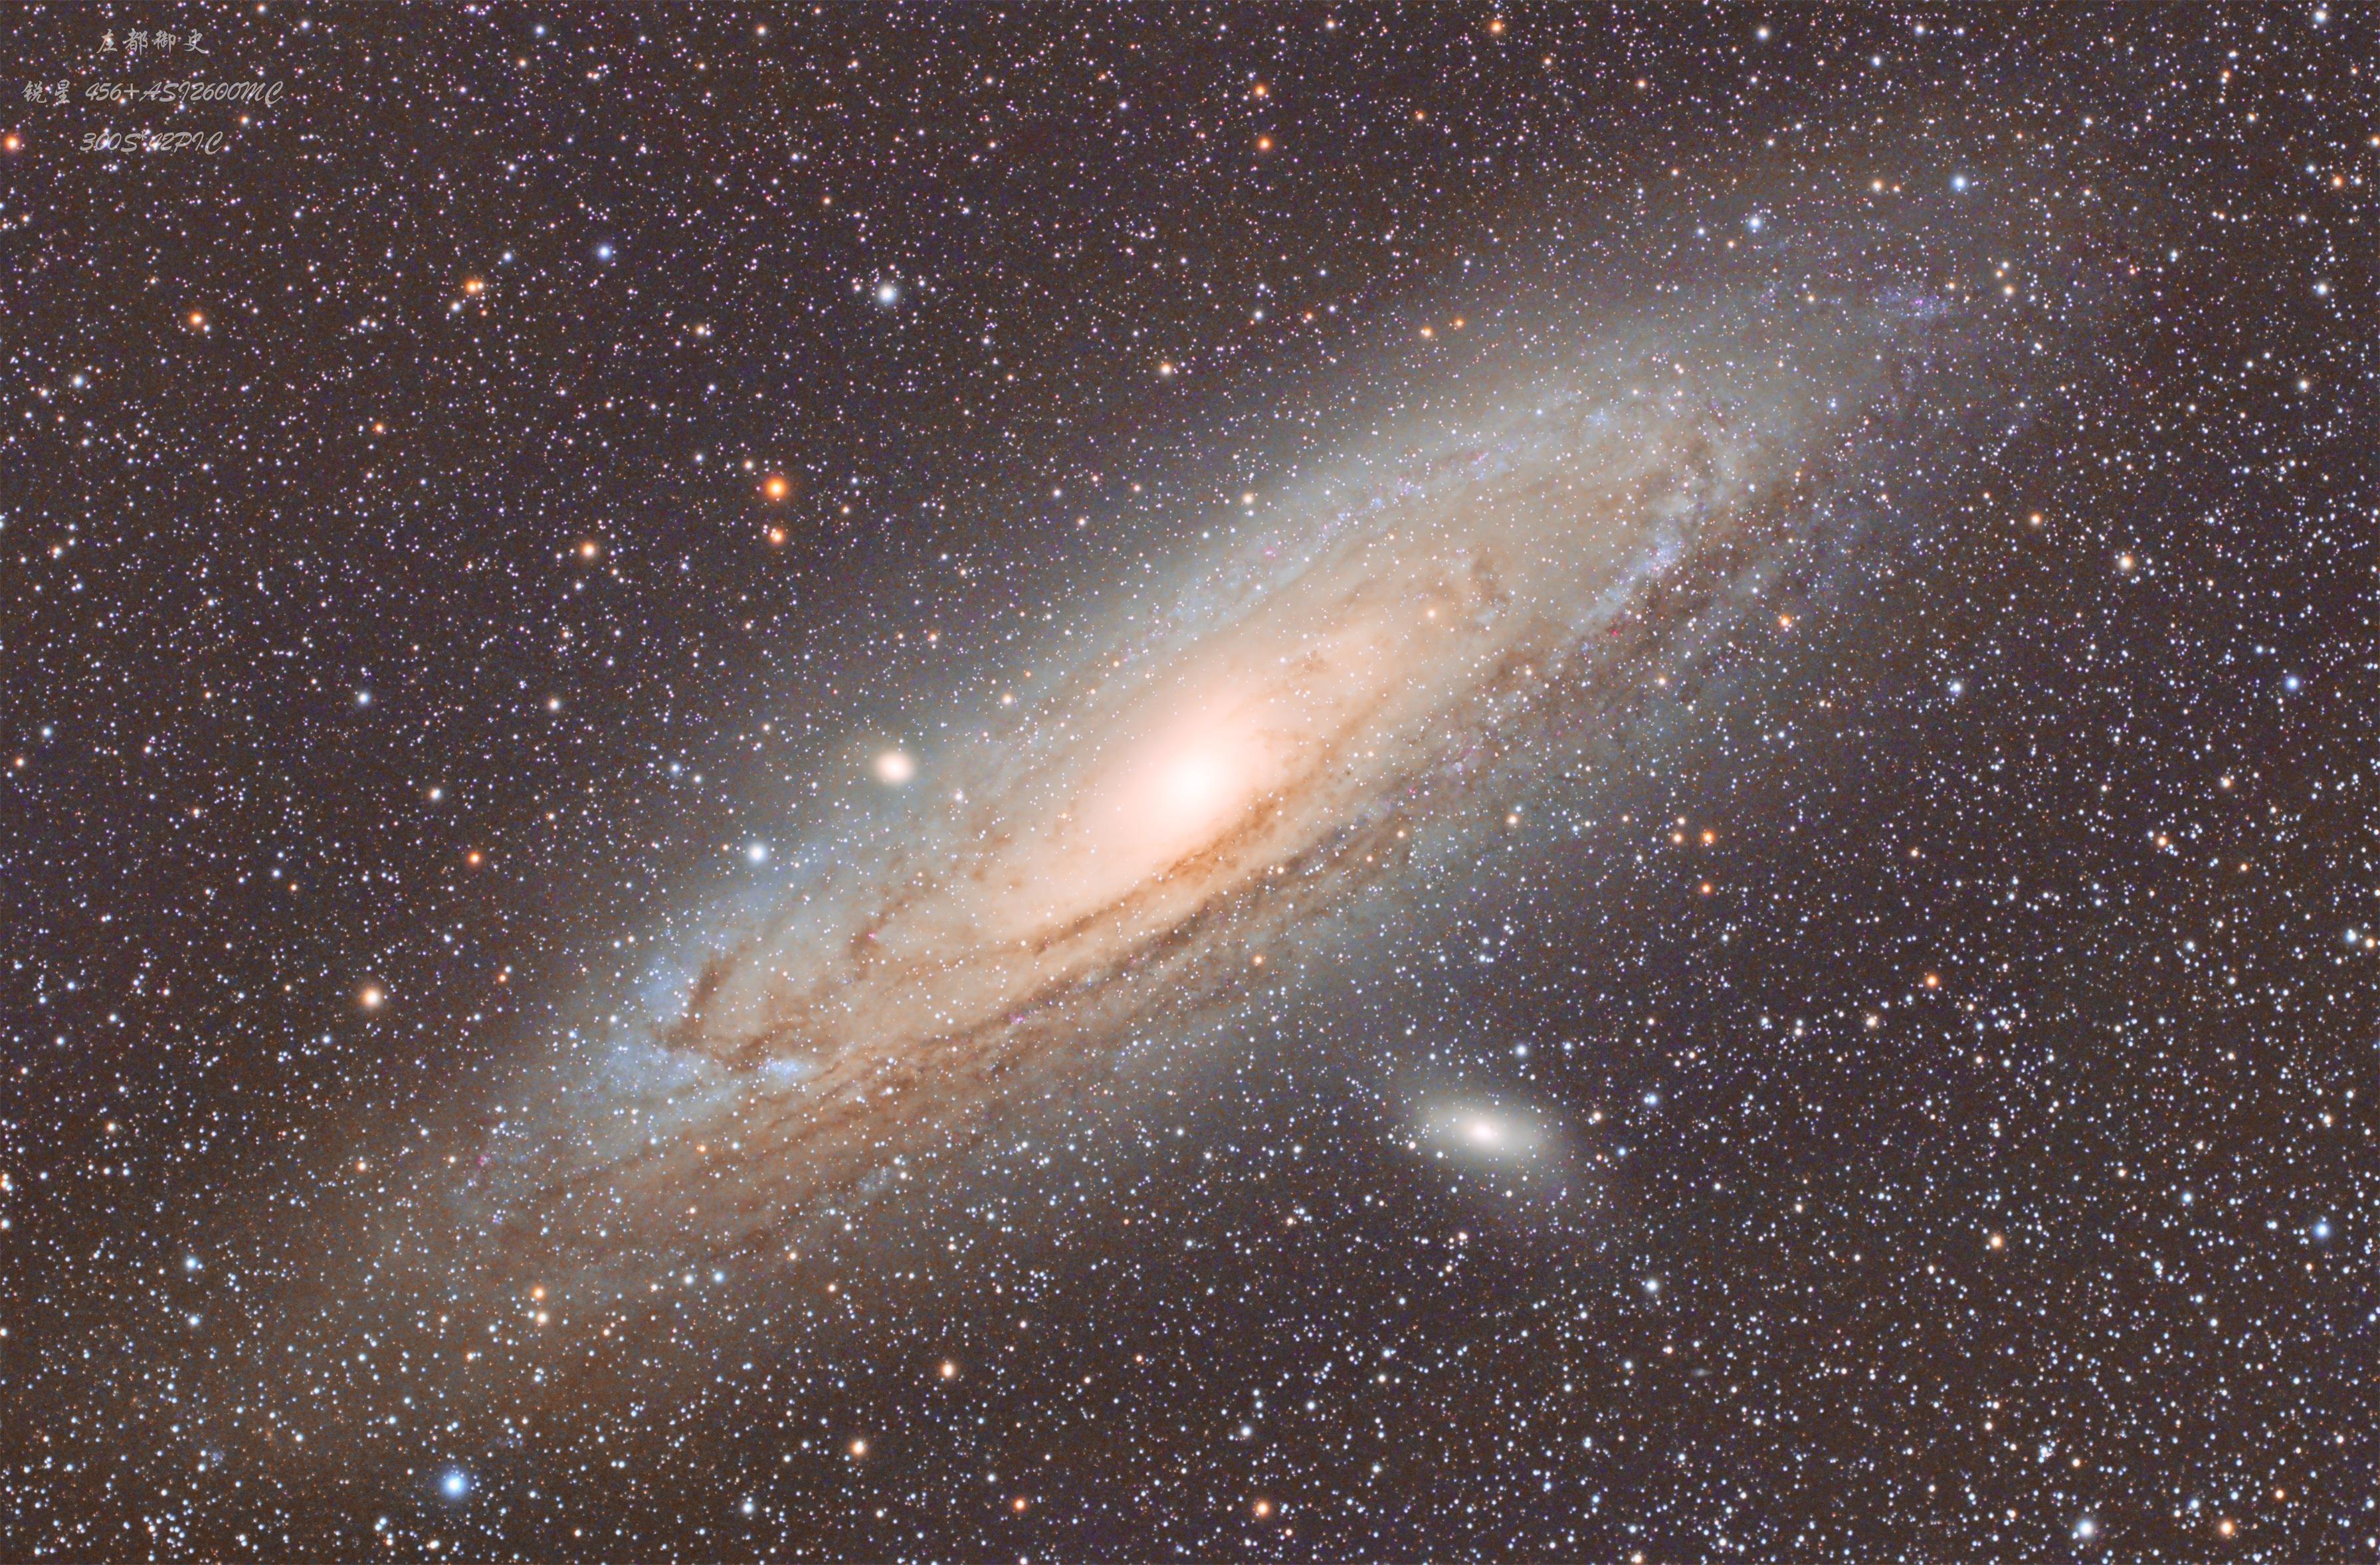 M31-300S X 42PICaaa.jpg